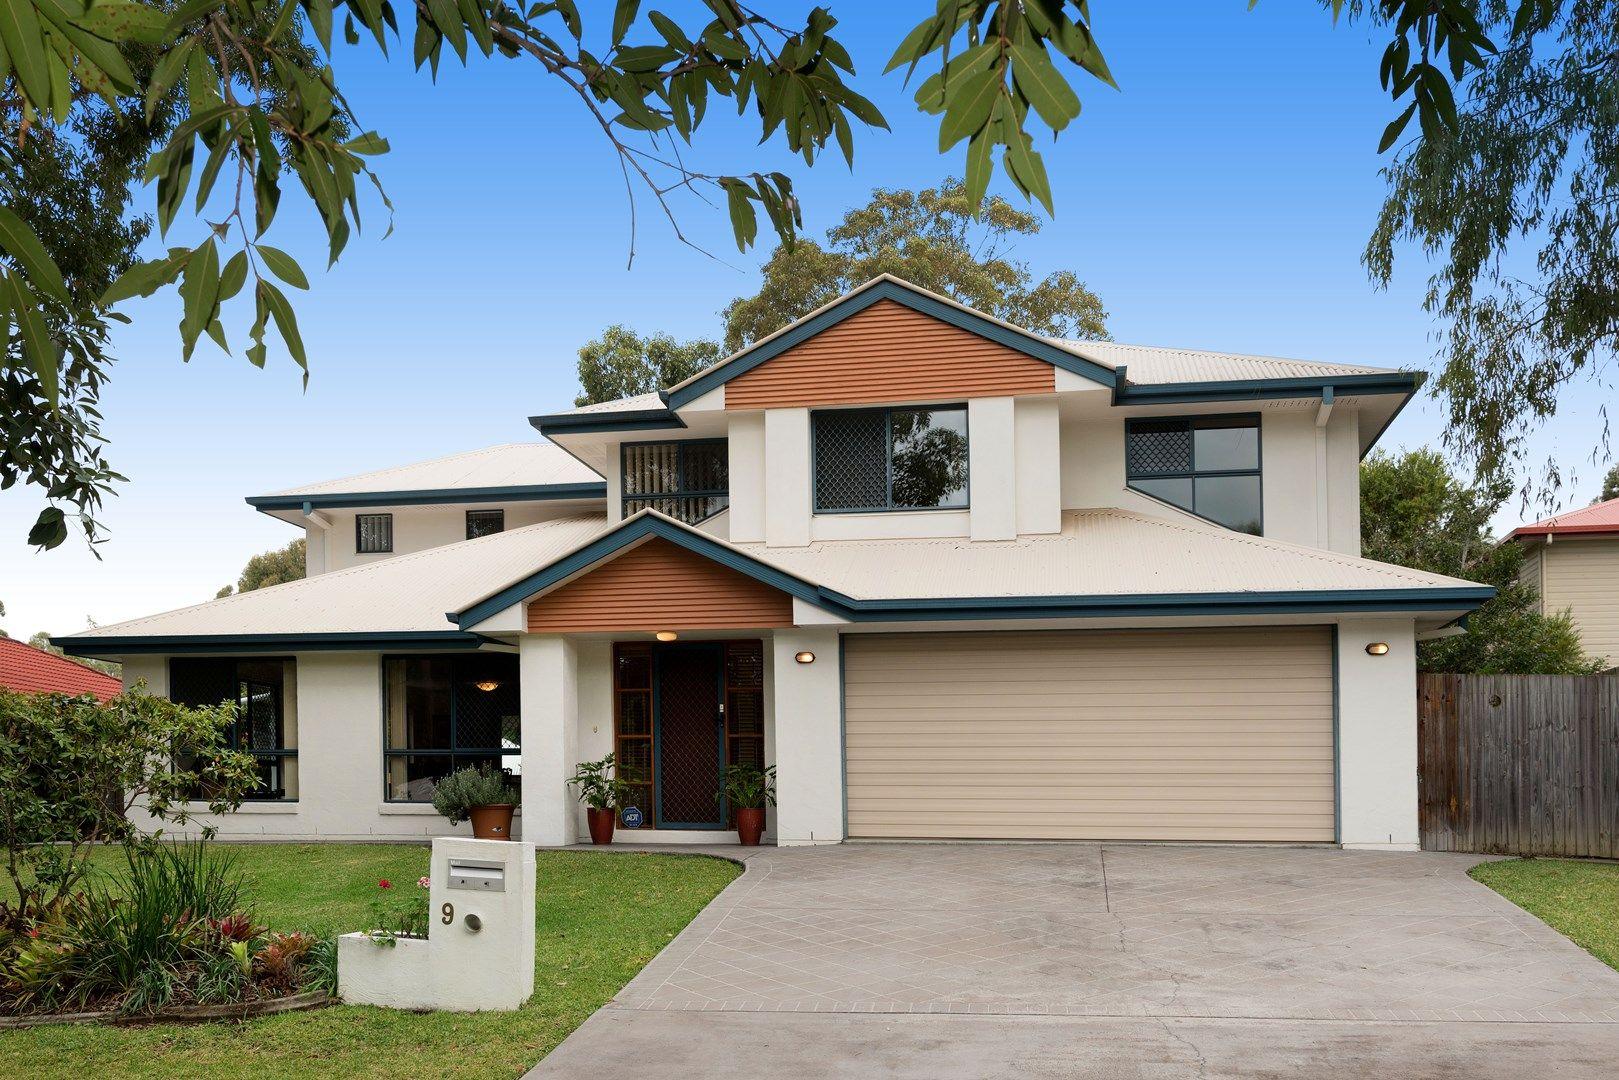 9 Barklya Crescent, Sinnamon Park QLD 4073, Image 0